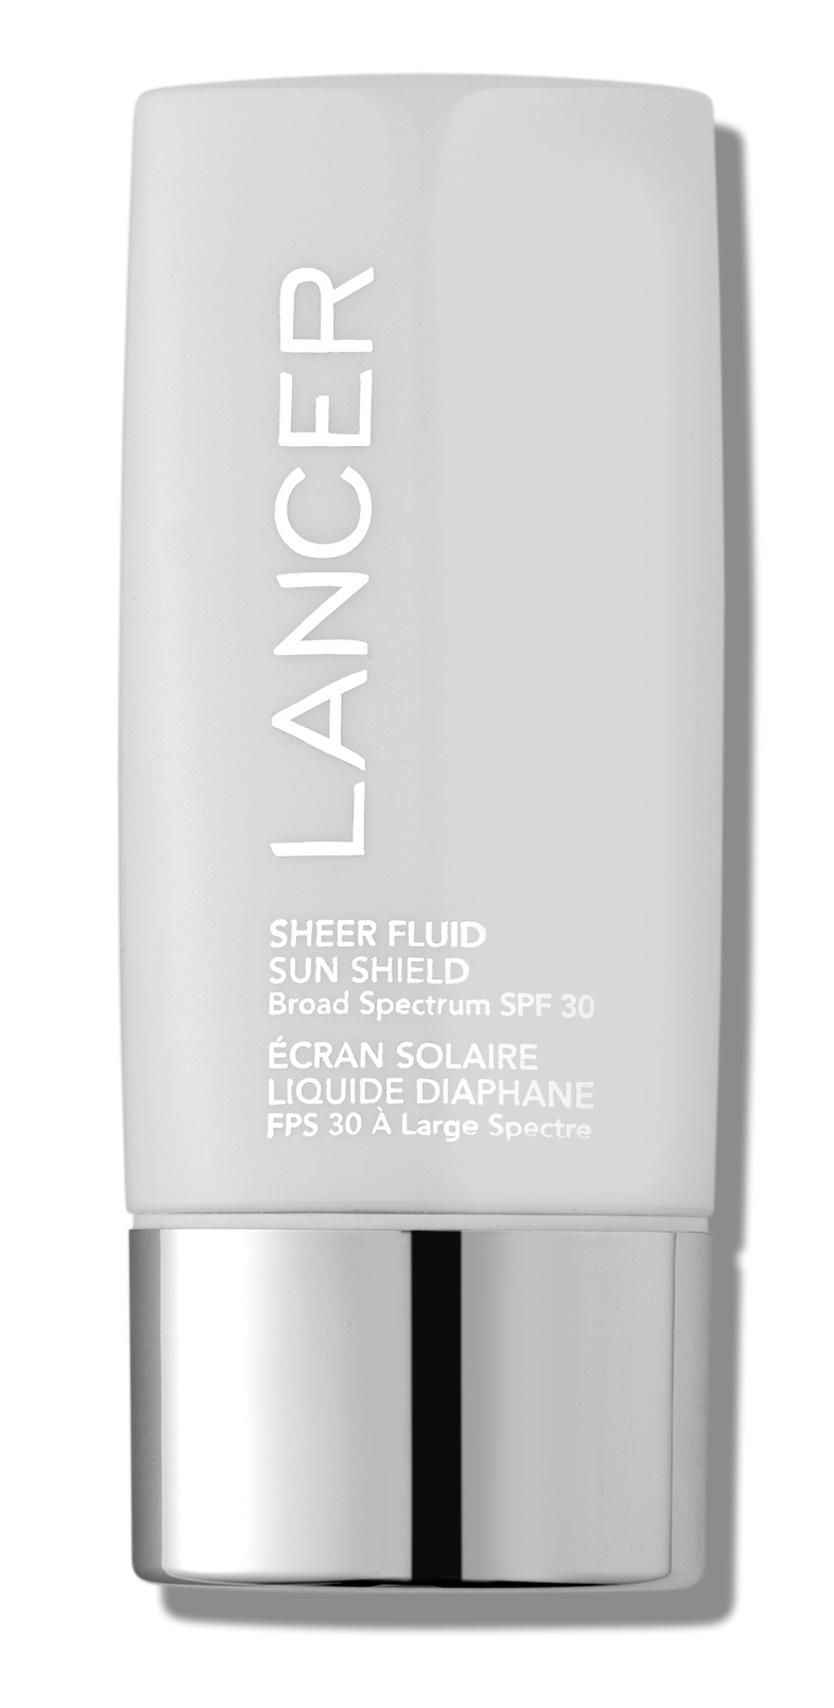 LANCER Sheer Fluid Sun Shield Broad Spectrum Spf 30